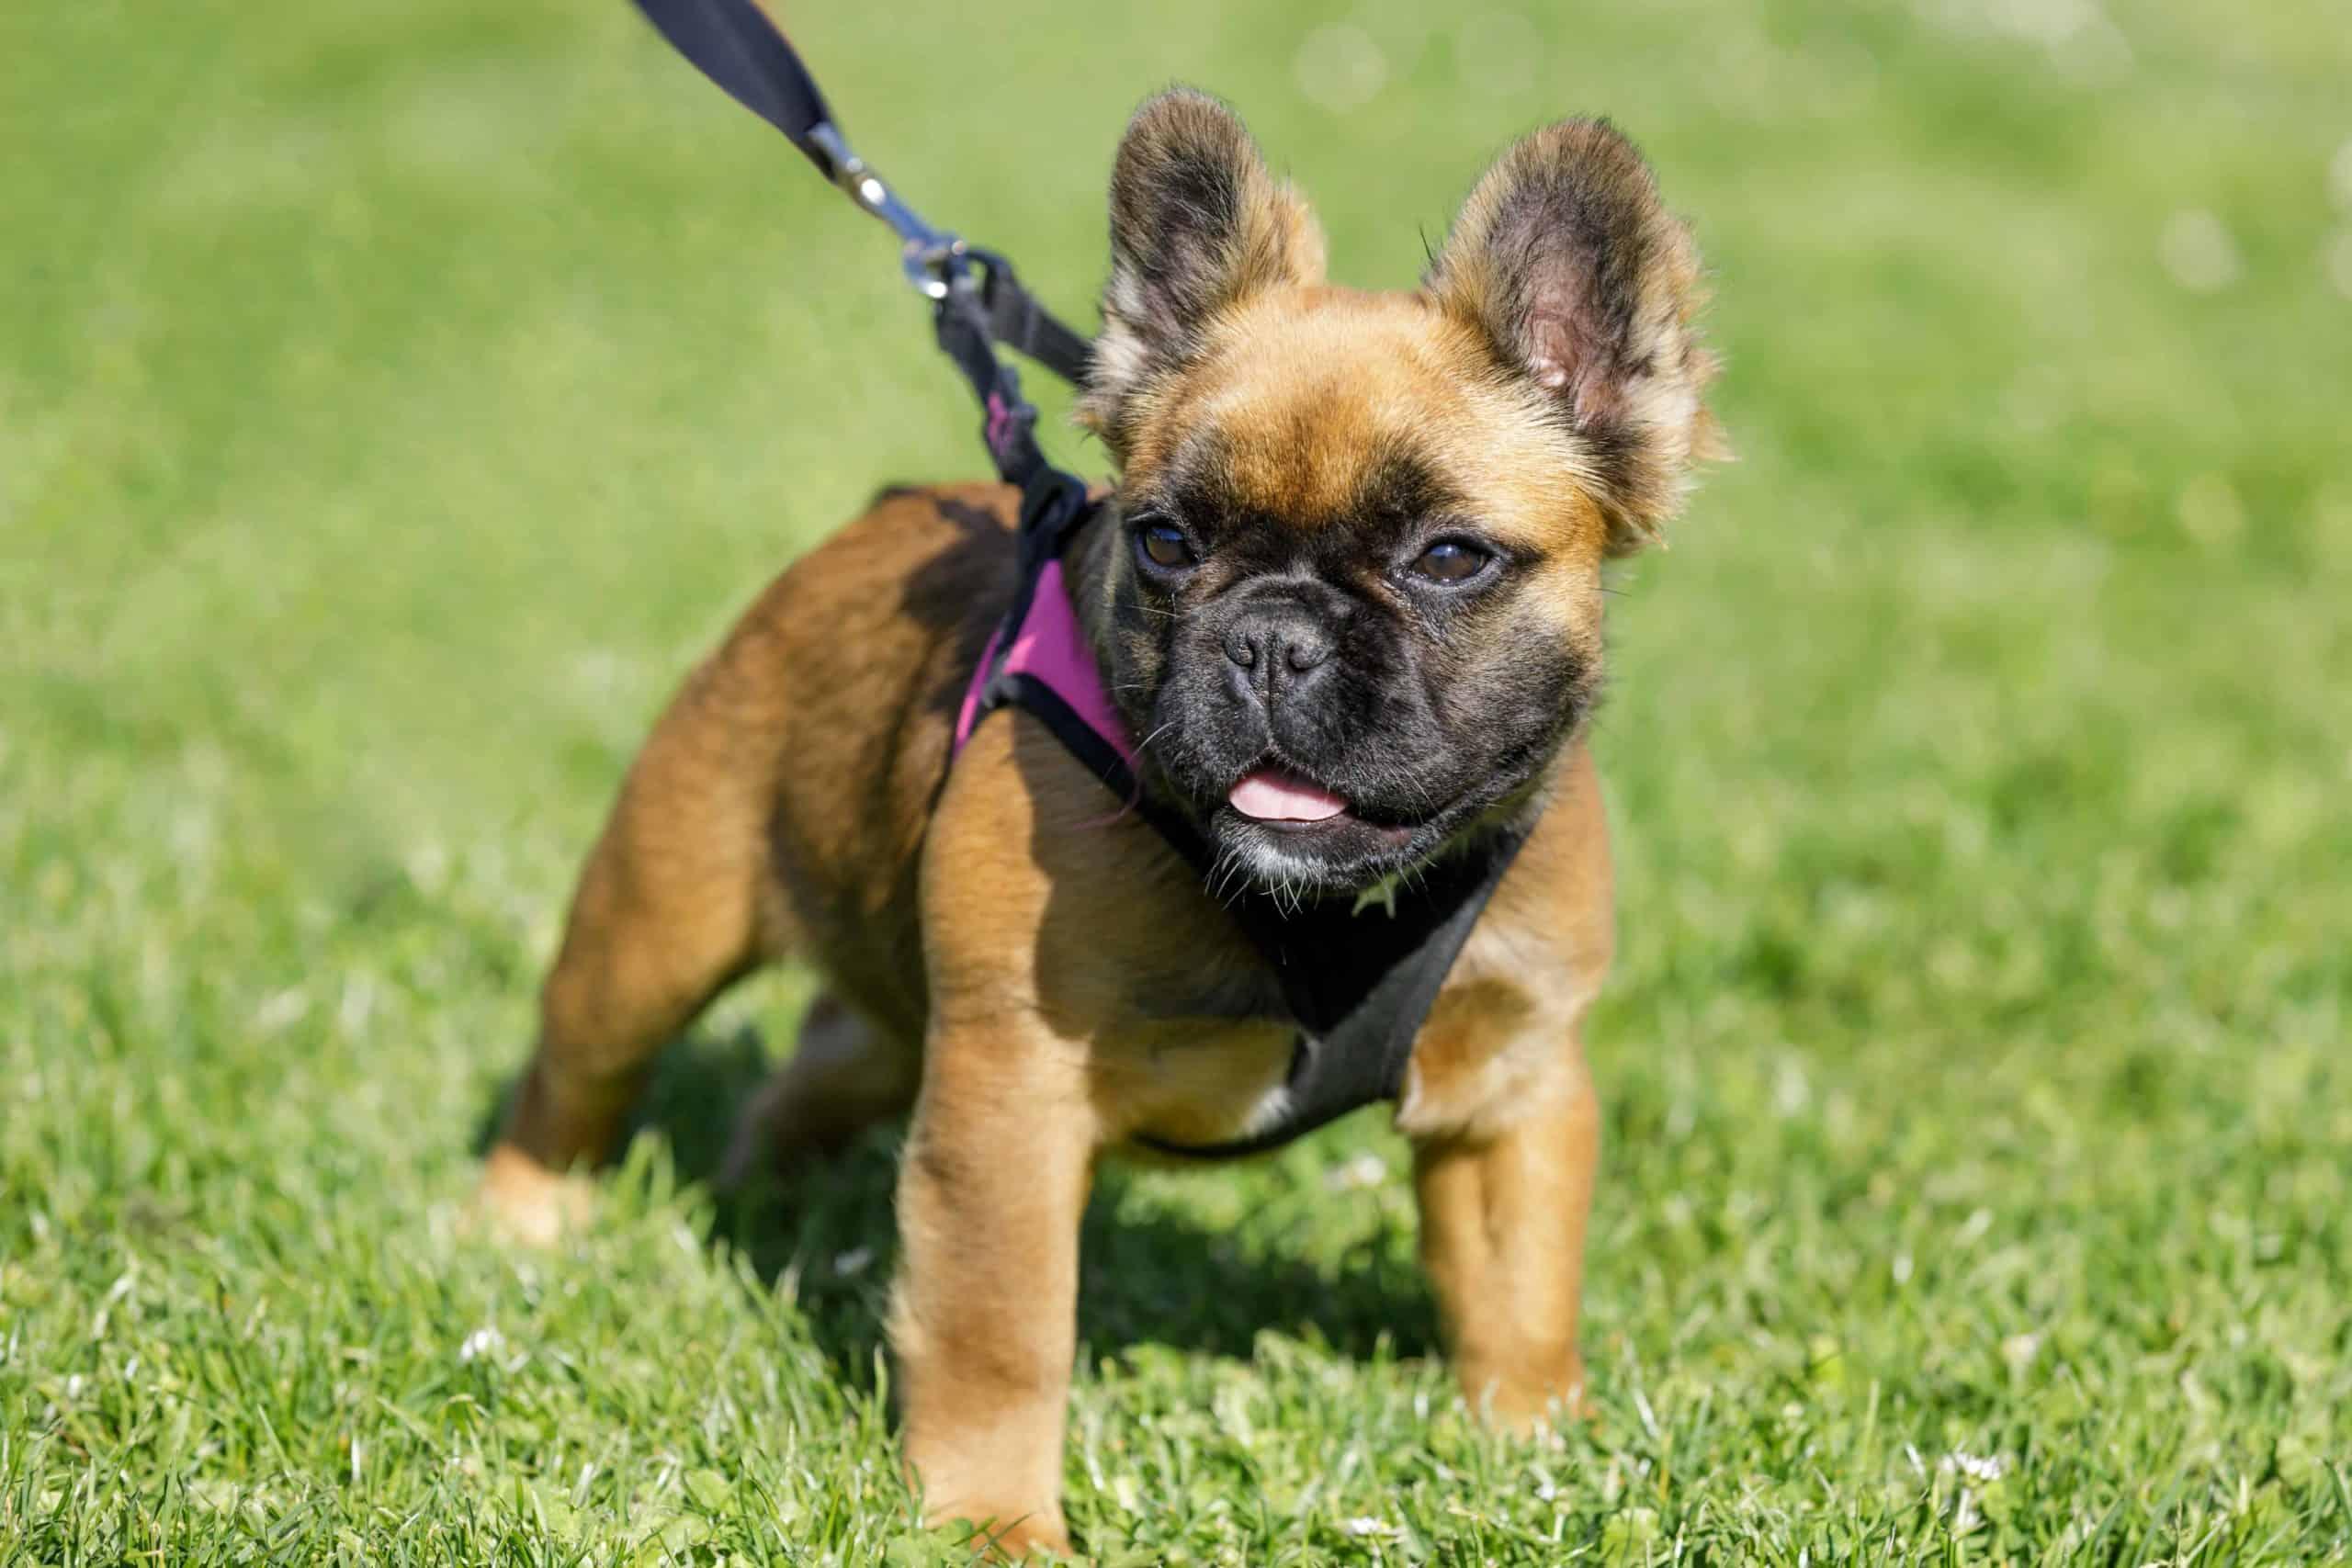 Fluffy French bulldog puppy wears harness.